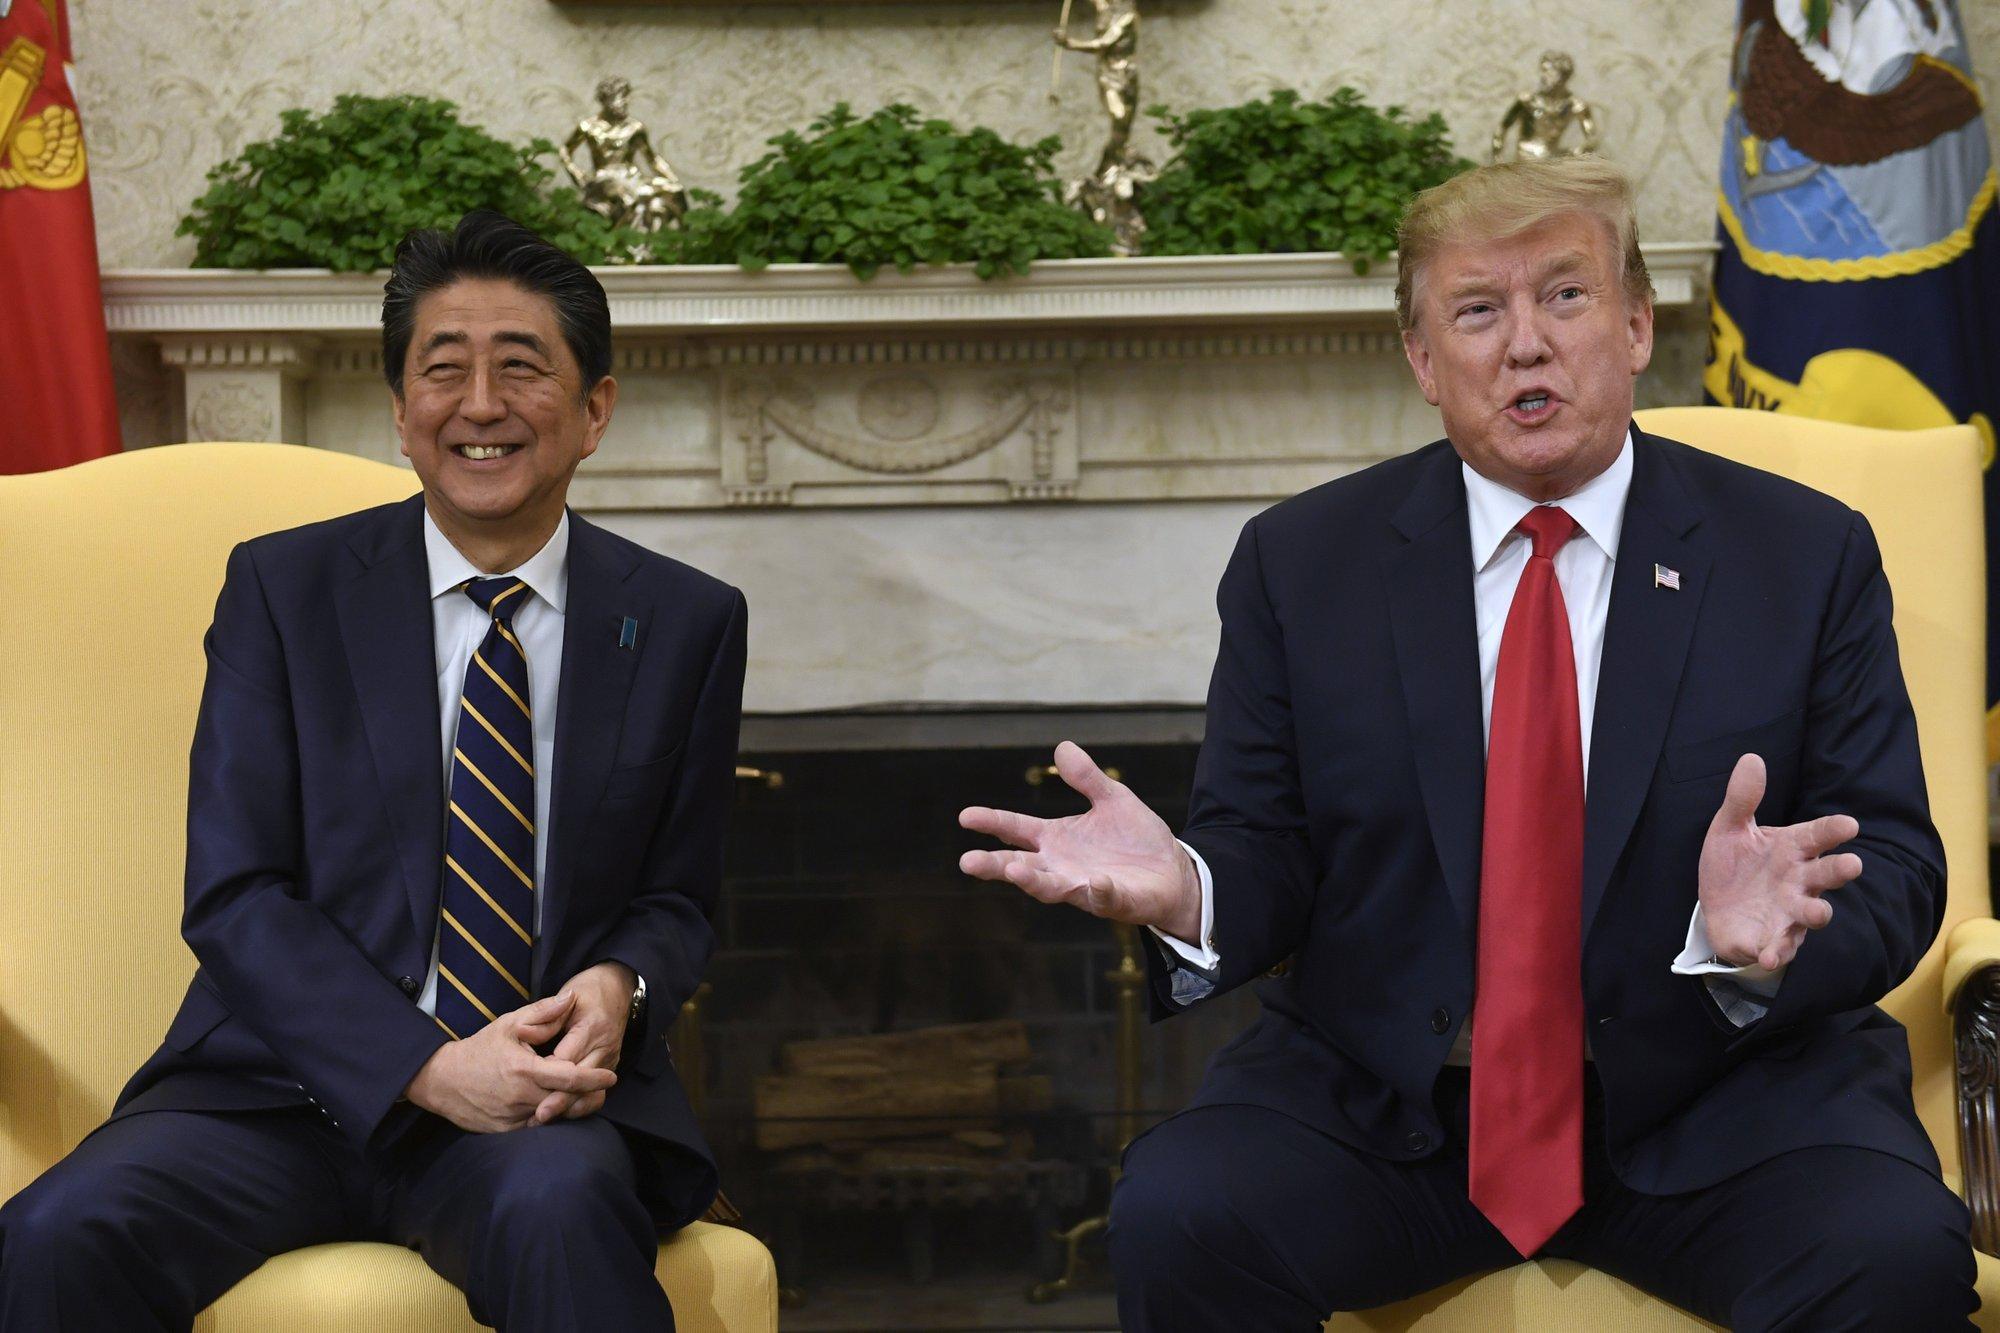 President Trump and Shinzo Abe